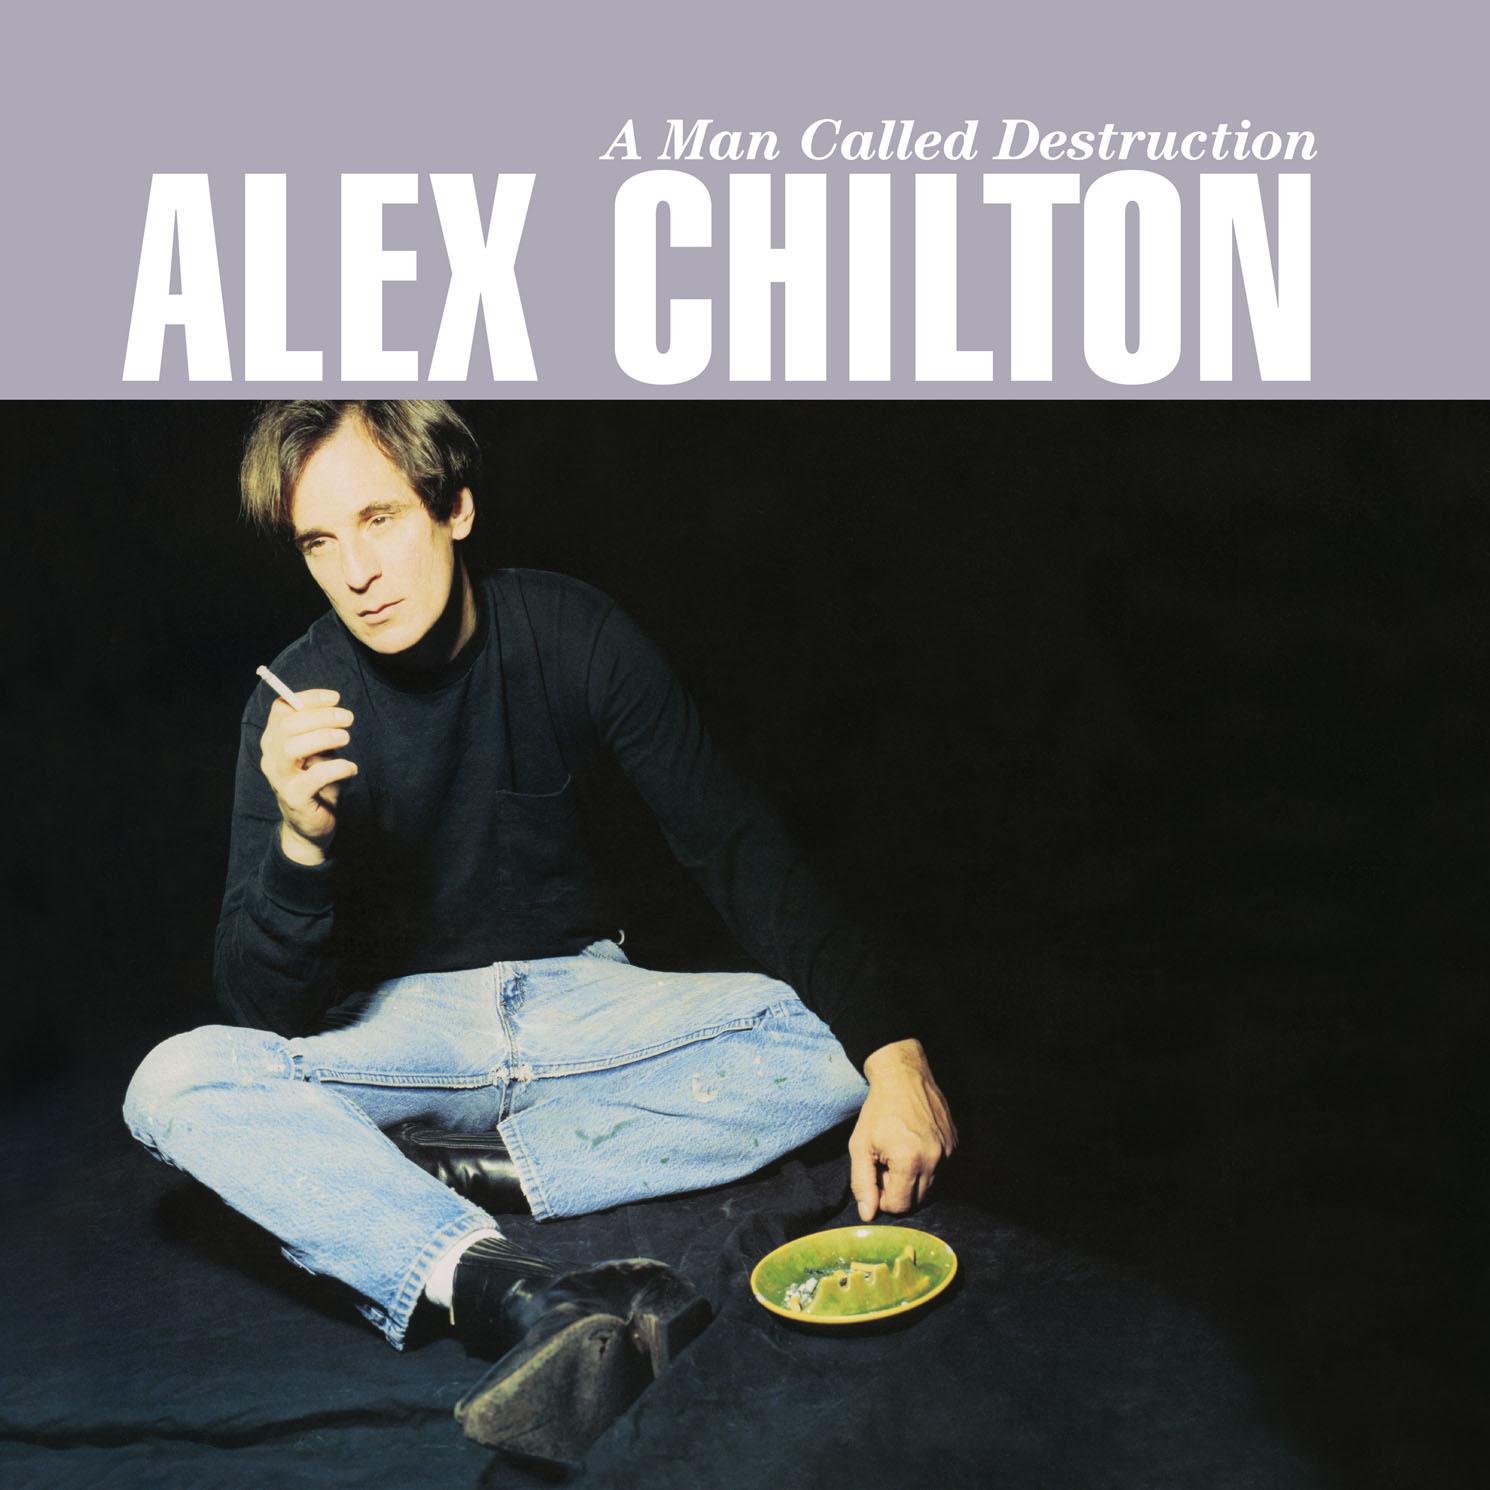 Alex Chilton - A Man Called Destruction  Release Date: August 25, 2017 Label: Omnivore Recordings  SERVICE: Restoration, Mastering NUMBER OF DISCS: 1 GENRE: Rock FORMAT: CD and LP